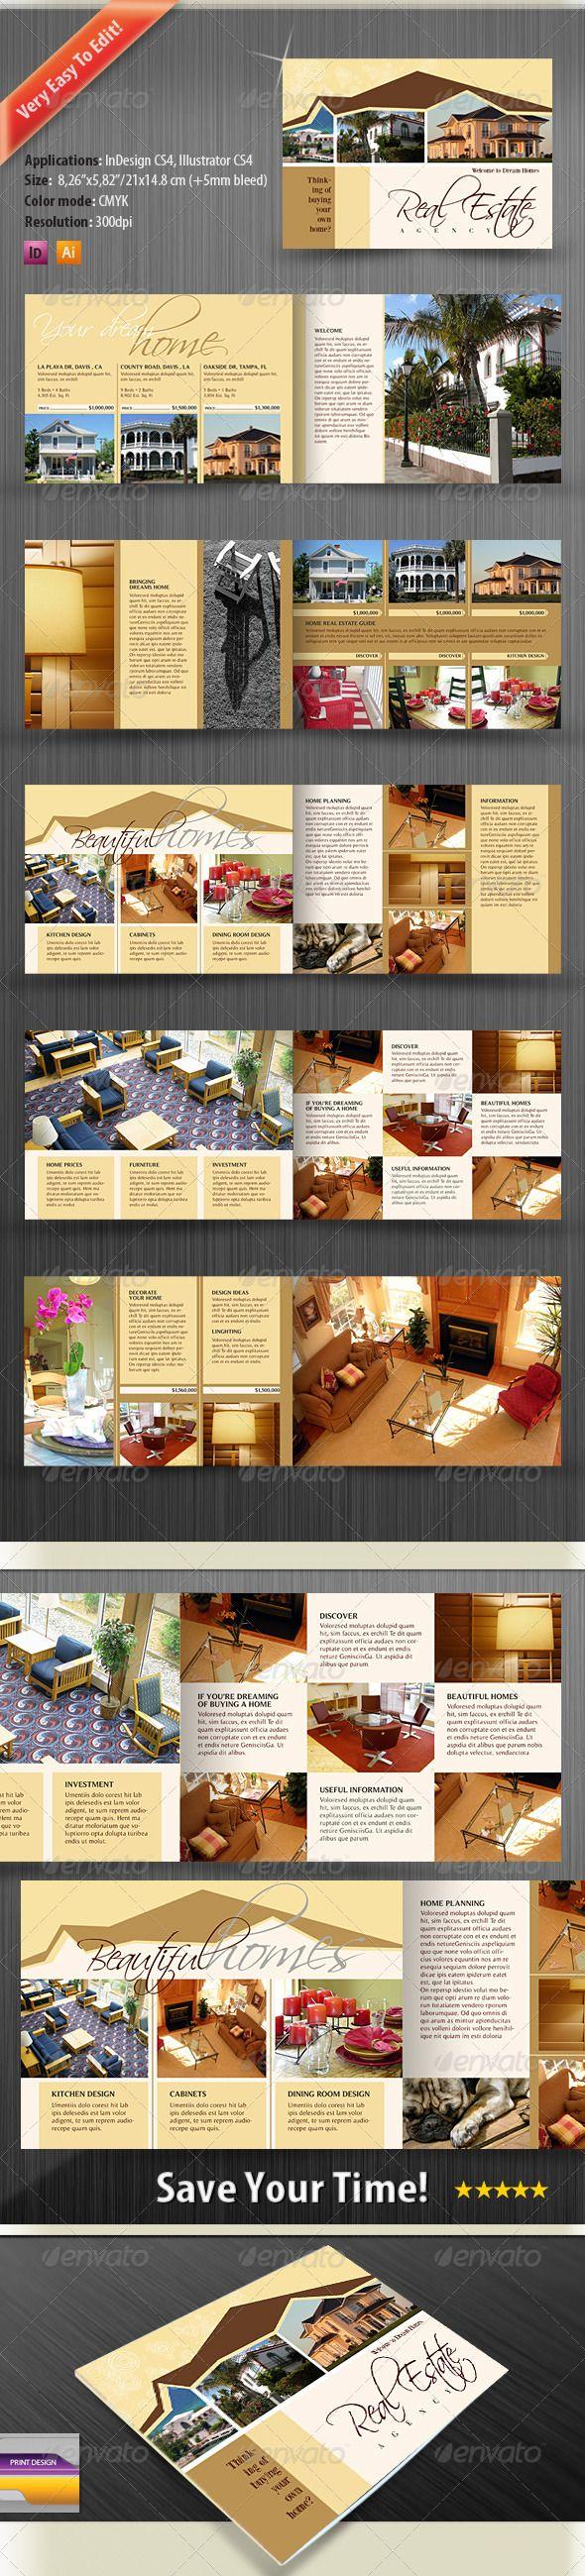 best images about real estate brochure real real estate catalog brochure